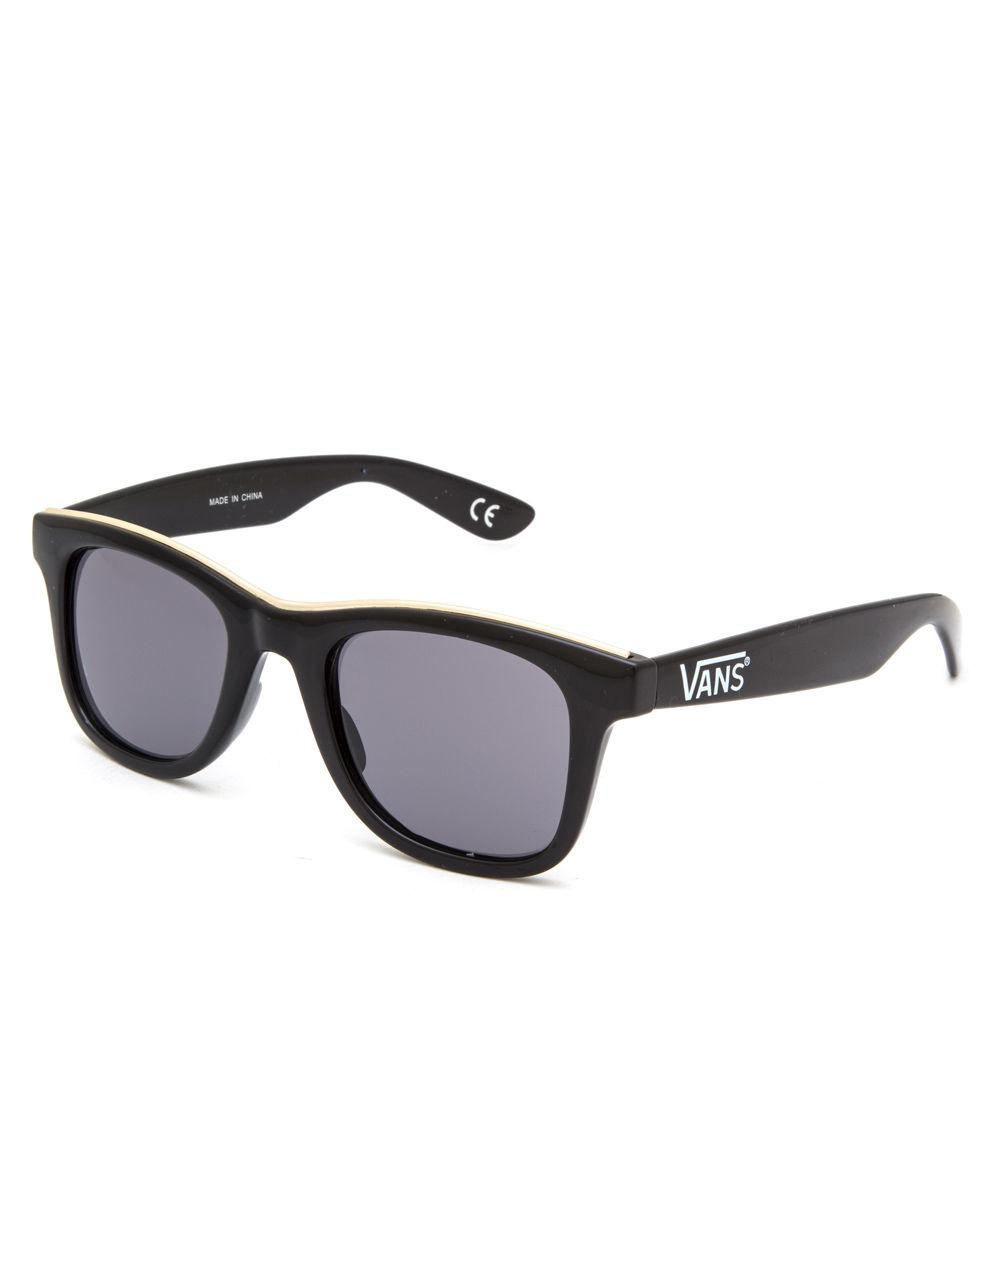 91a019fcc2 Lyst - Vans Breakwater Sunglasses in Black for Men